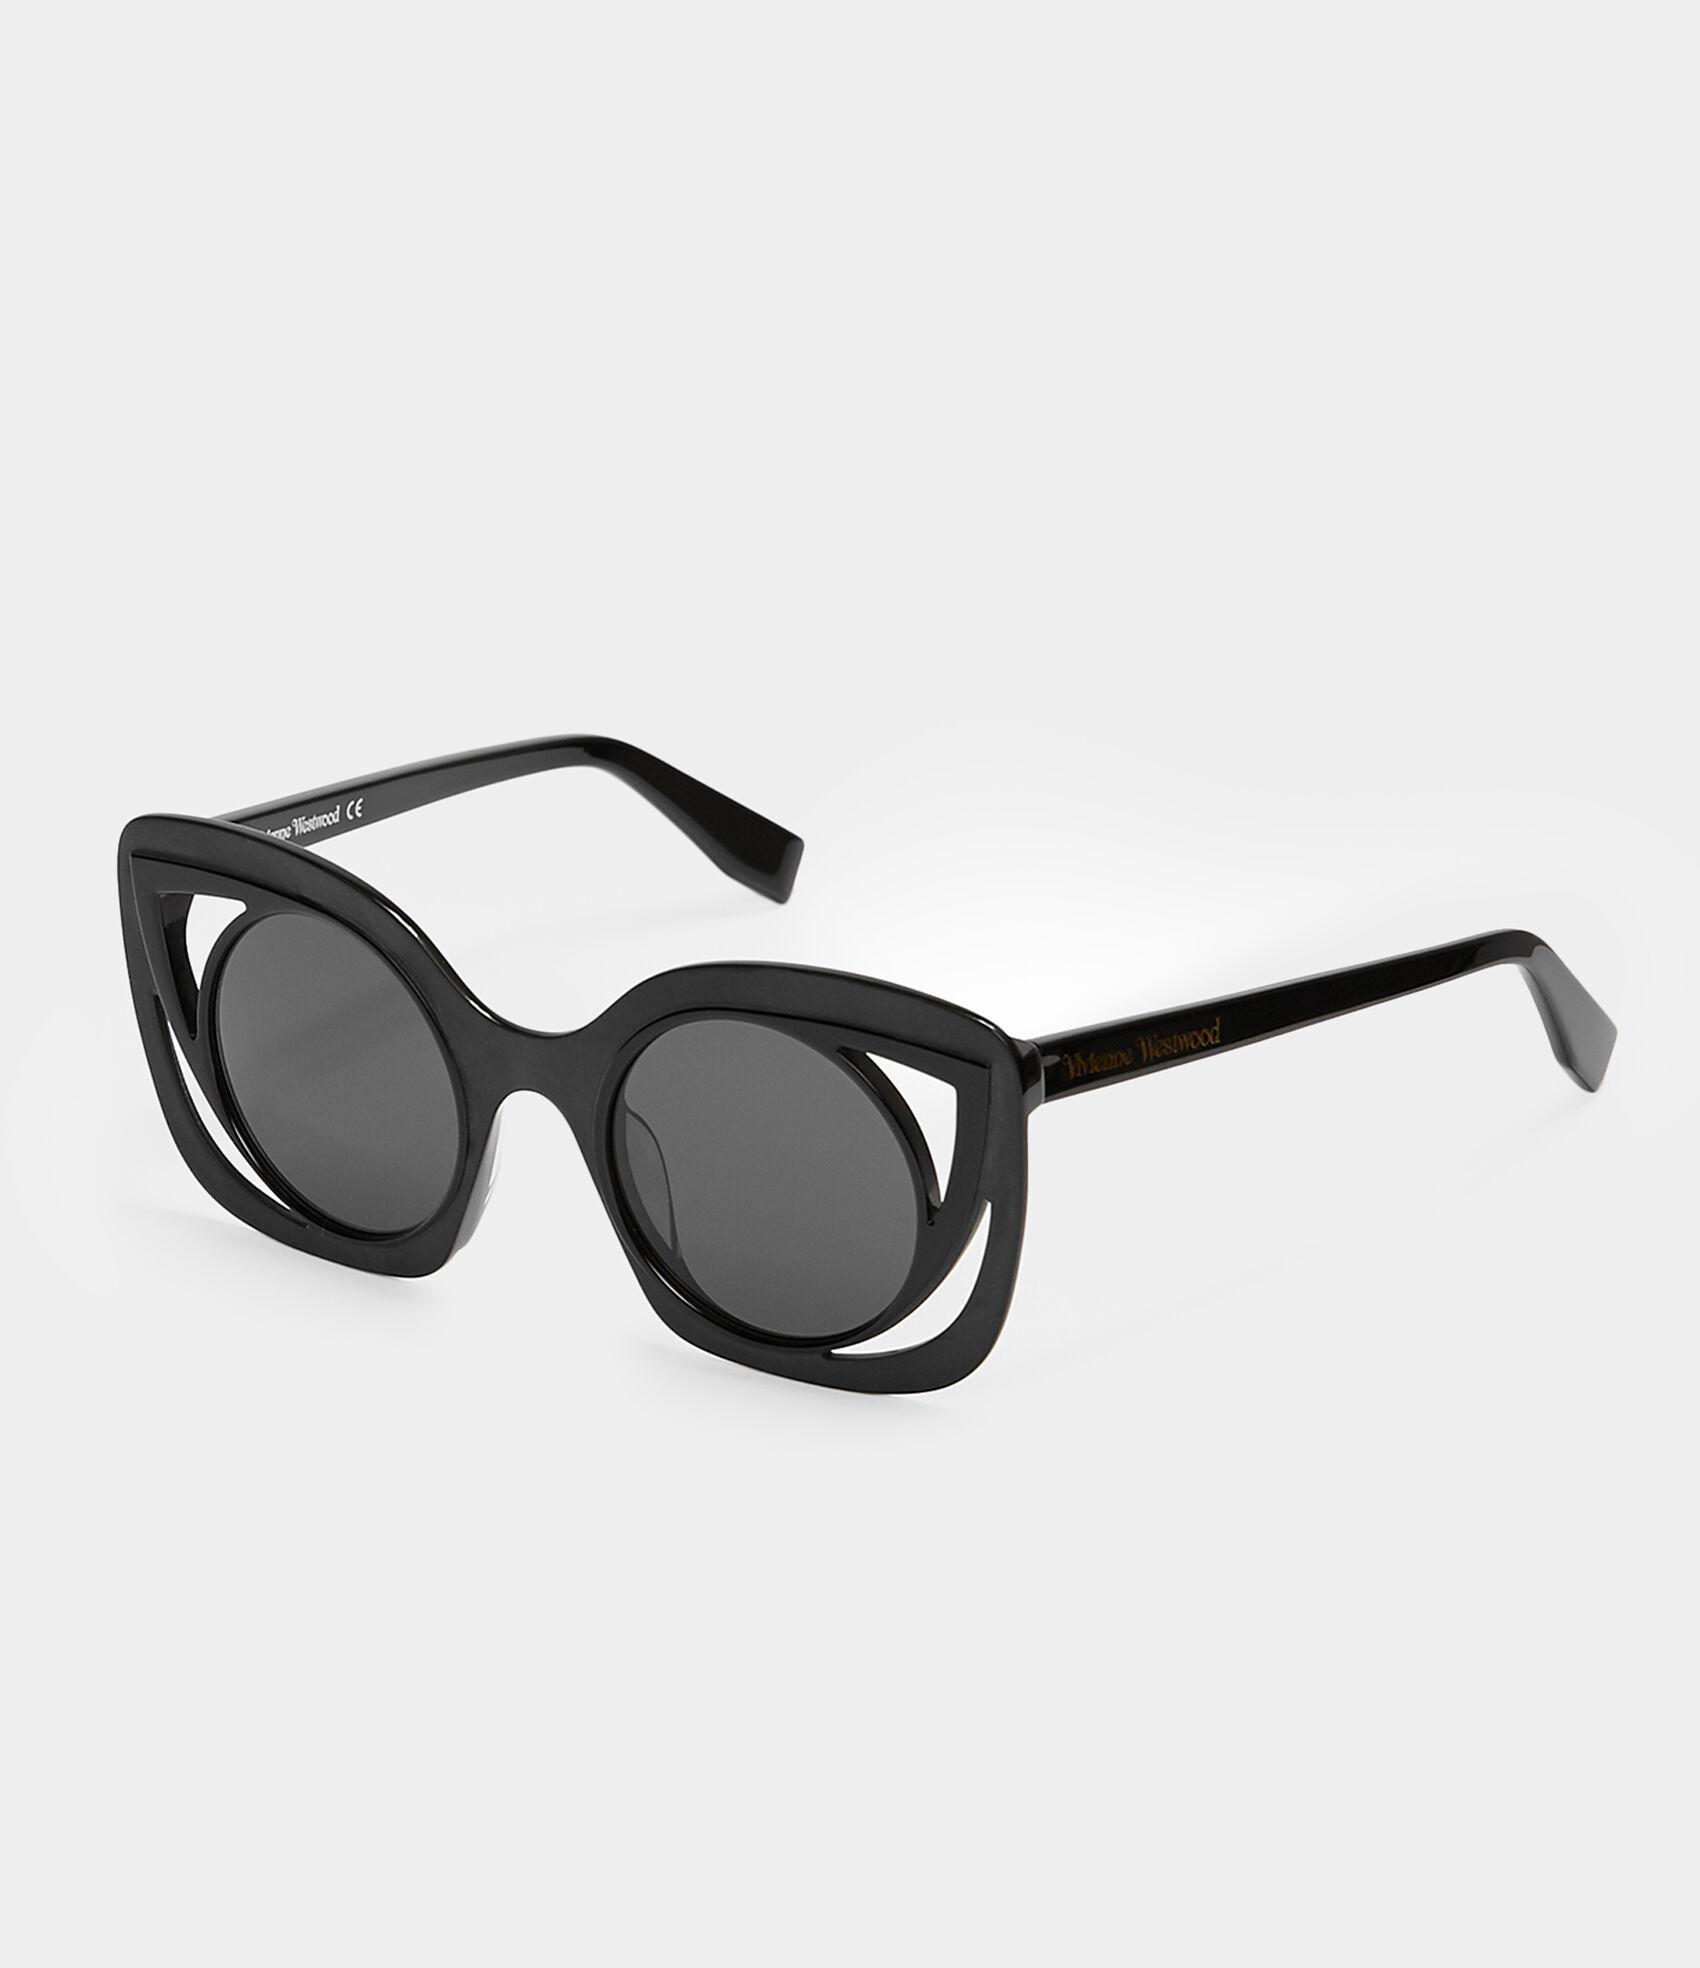 416126aa51d Vivienne Westwood Women s Designer Sunglasses